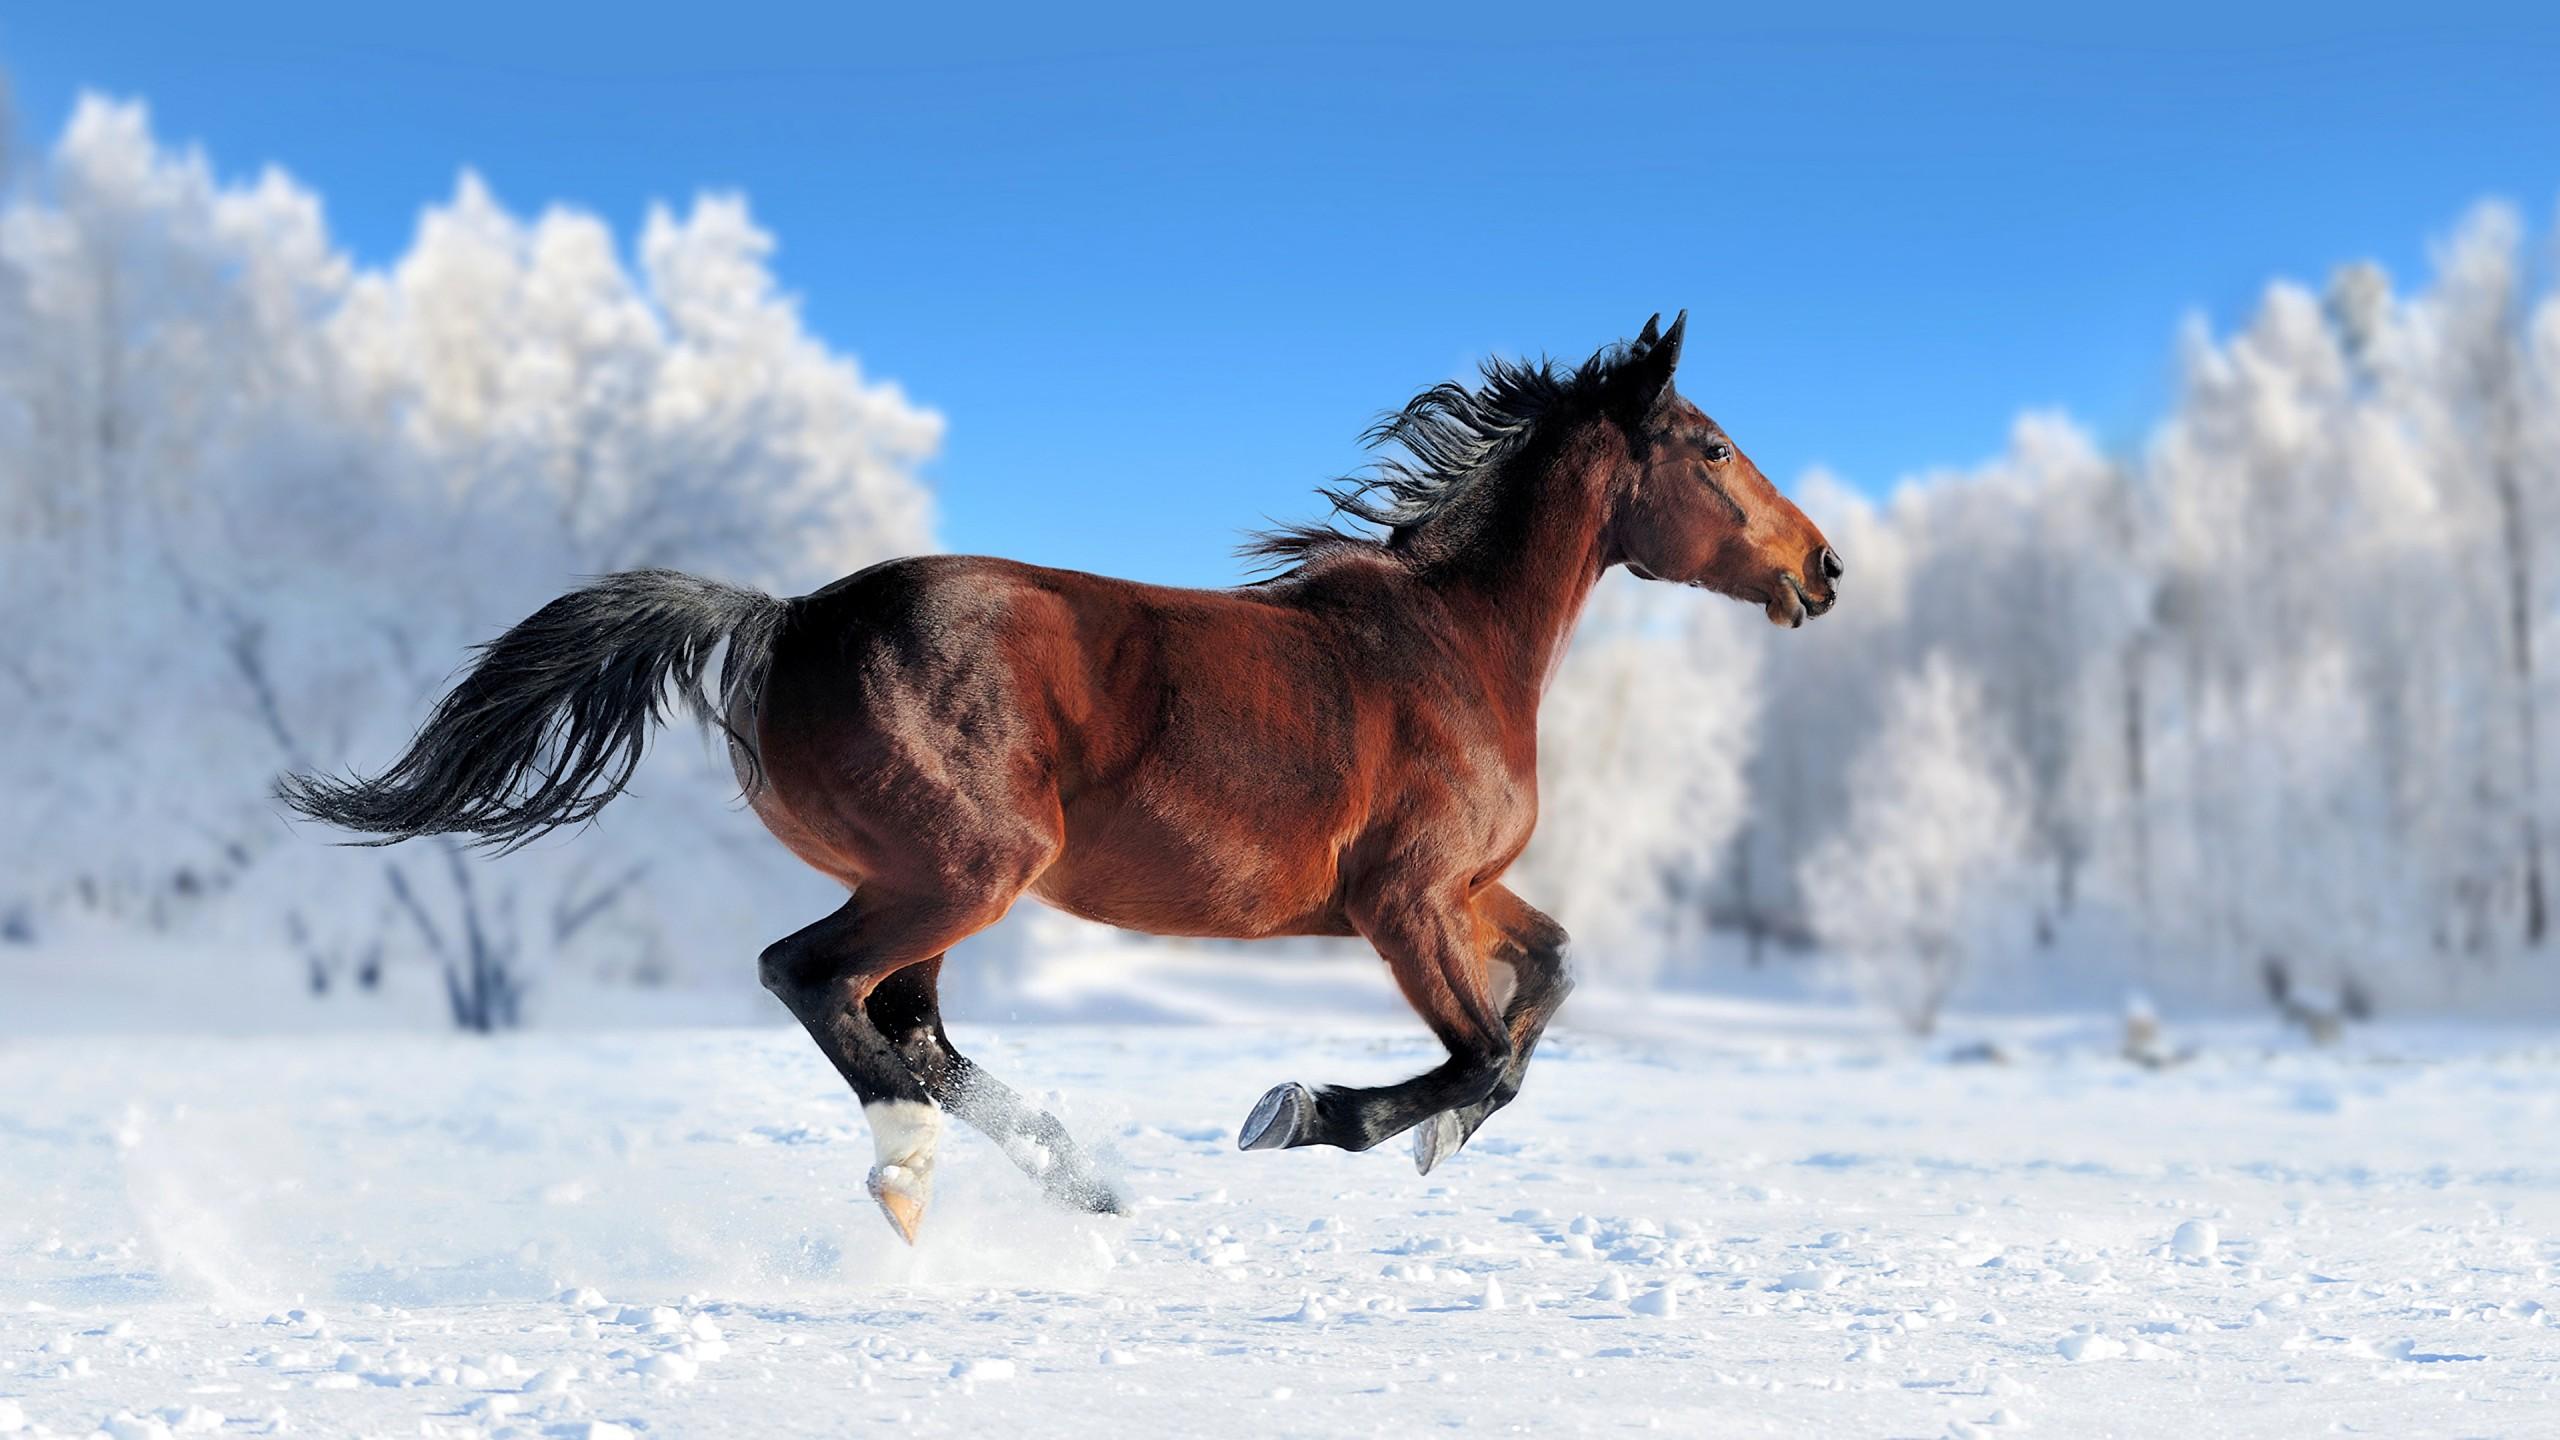 Wallpaper horse cute animals snow winter 4k Animals